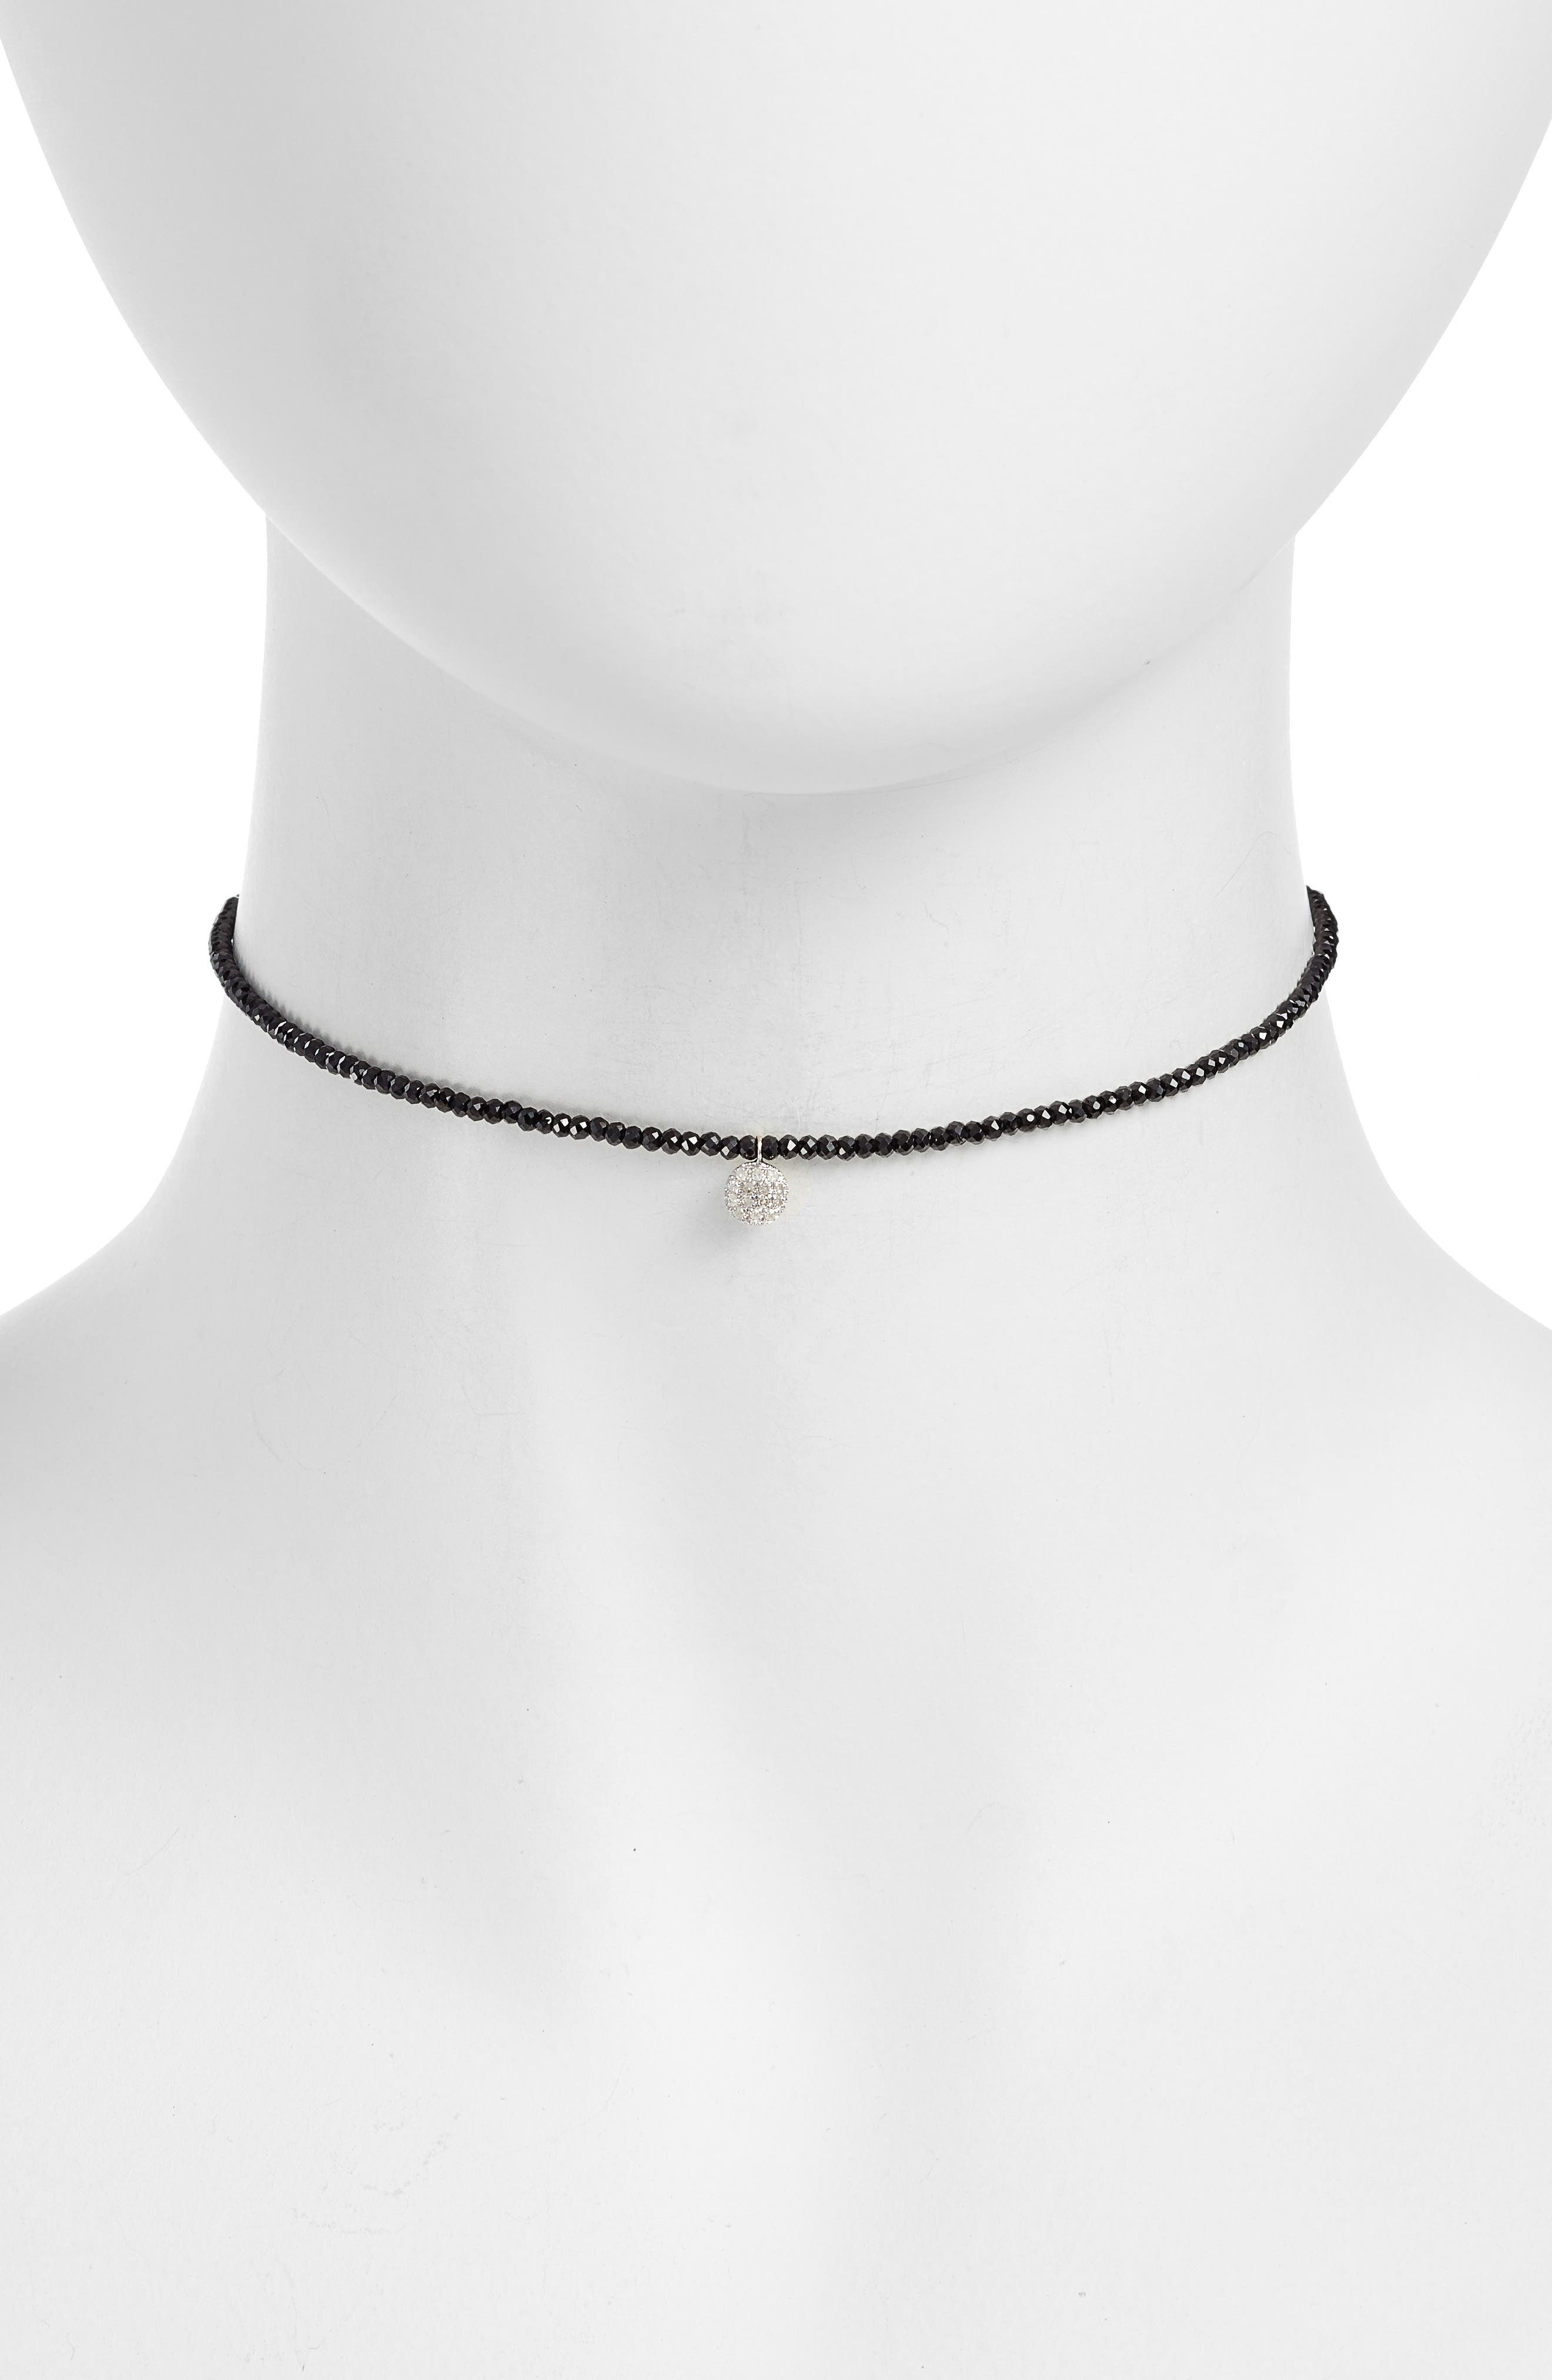 Diamond Charm Choker Necklace,                         Main,                         color, White Gold